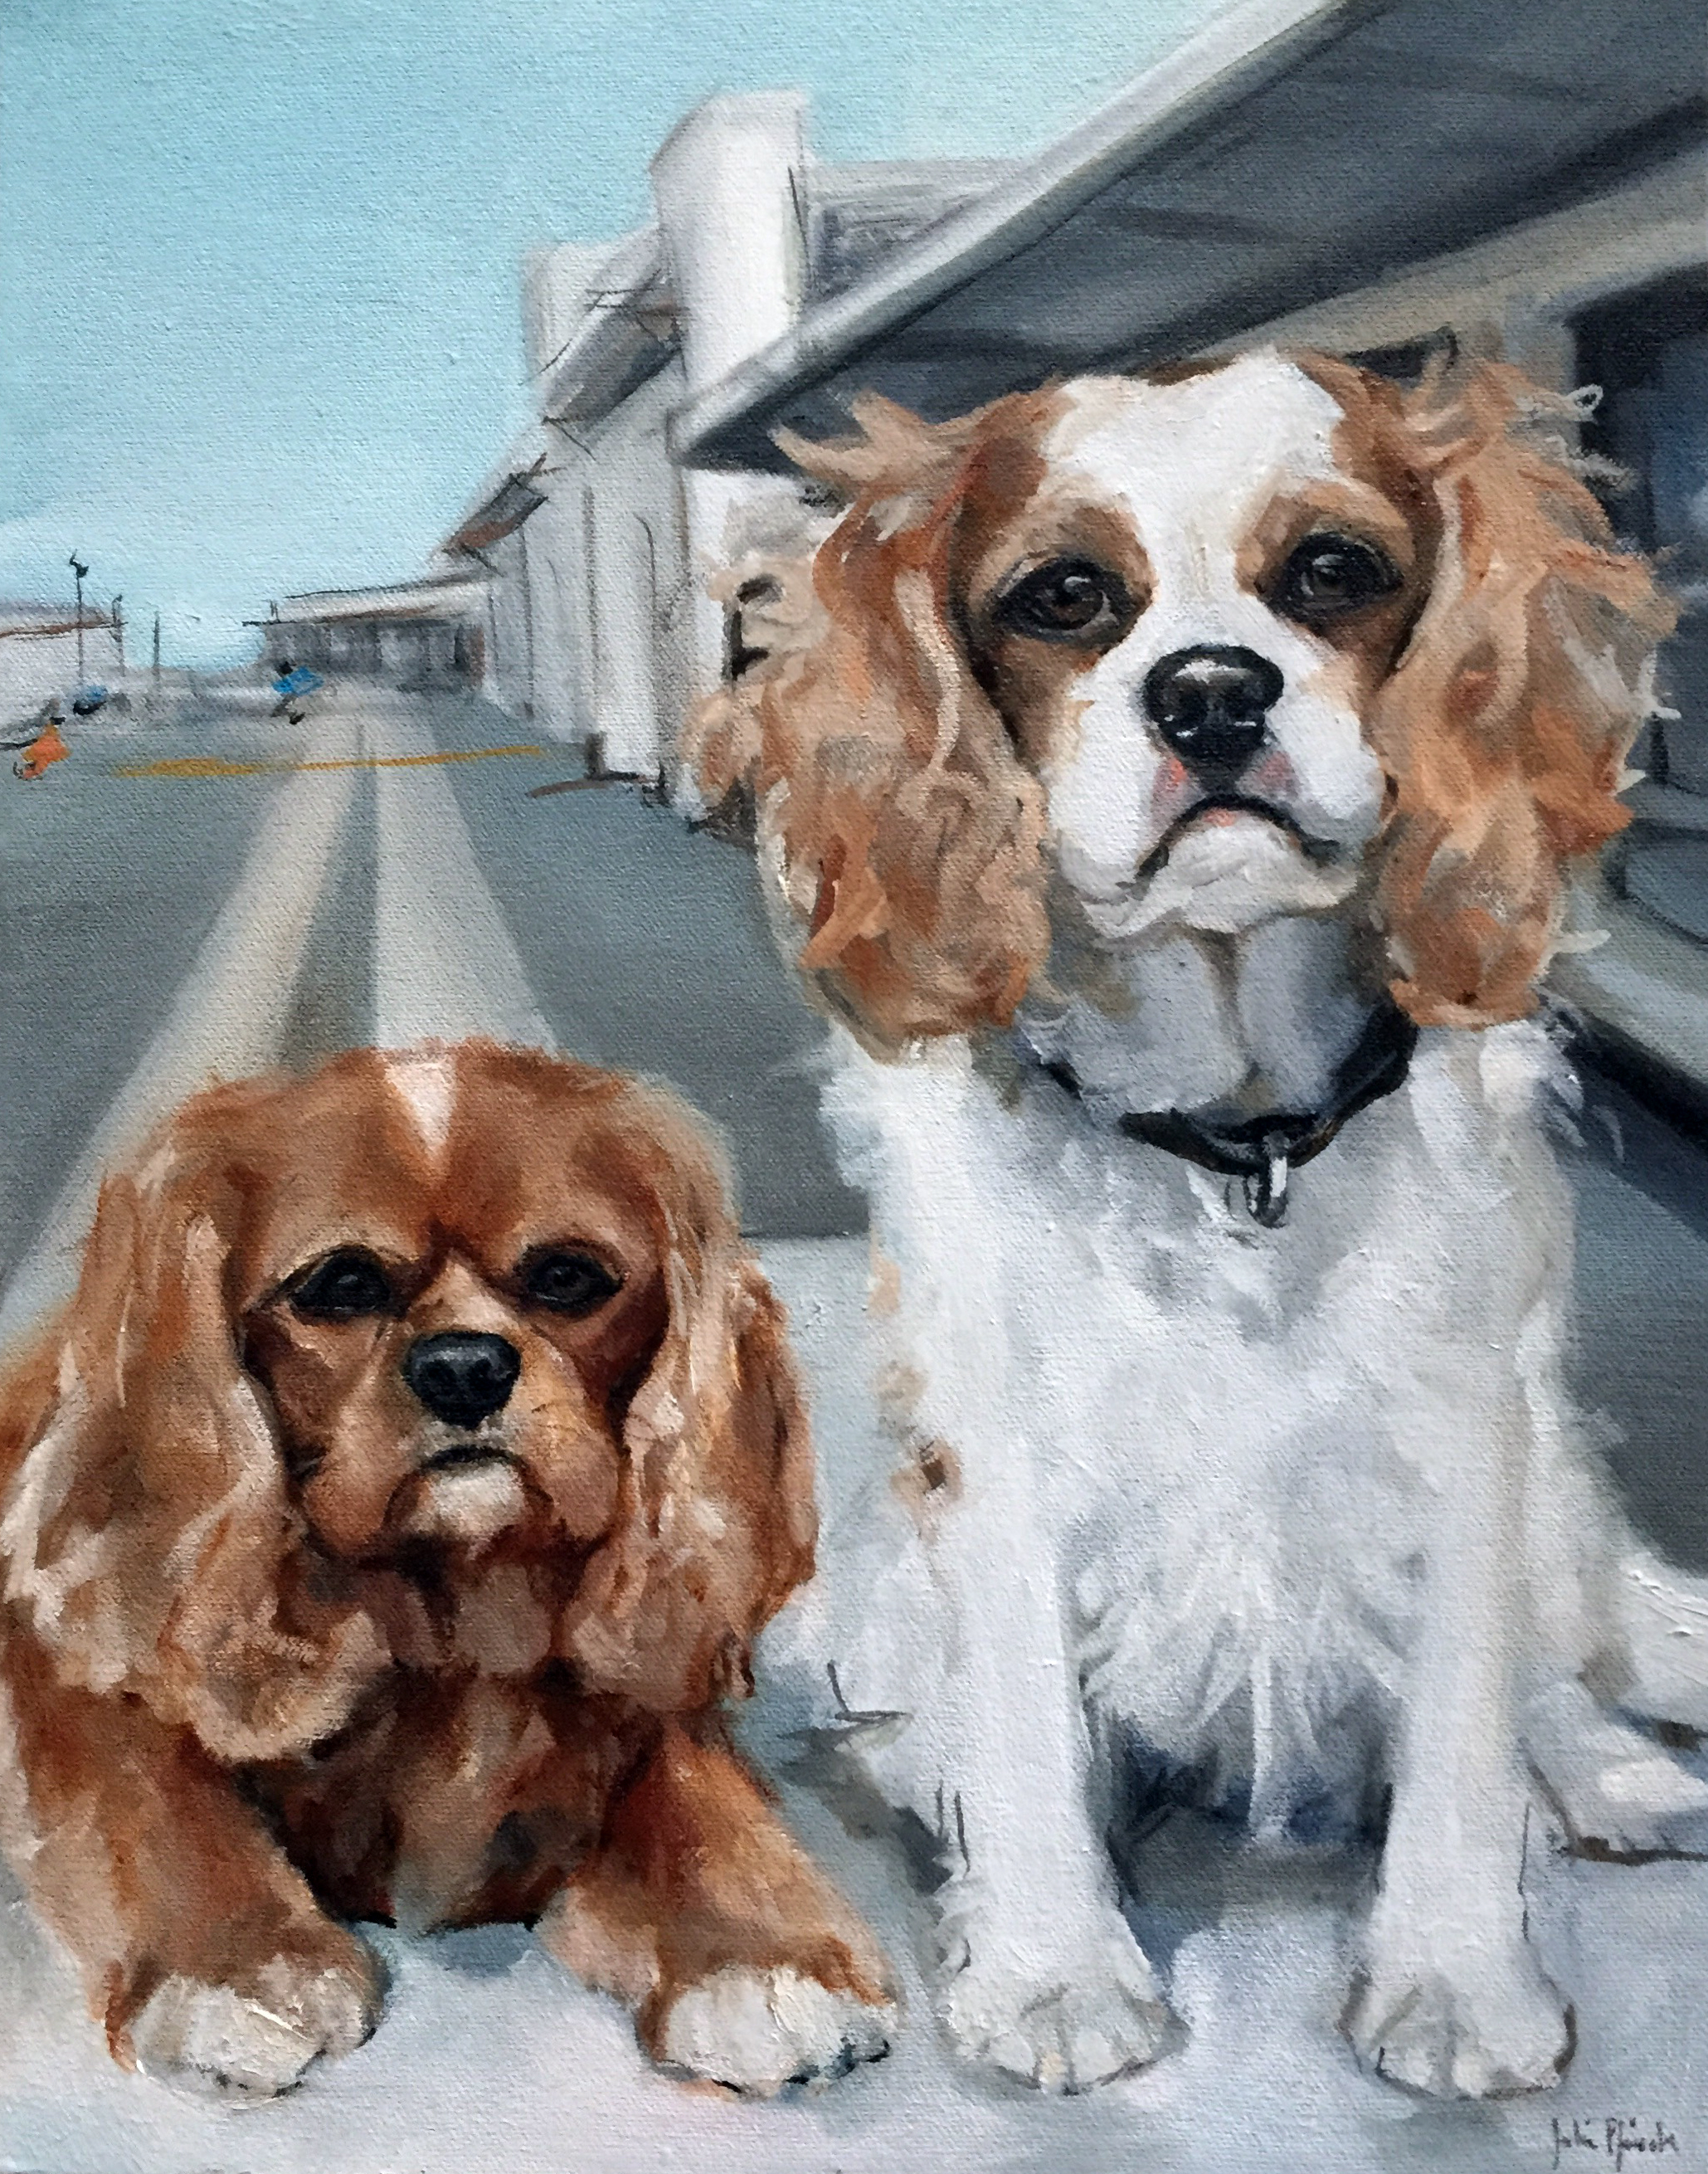 Peanut and Dottie